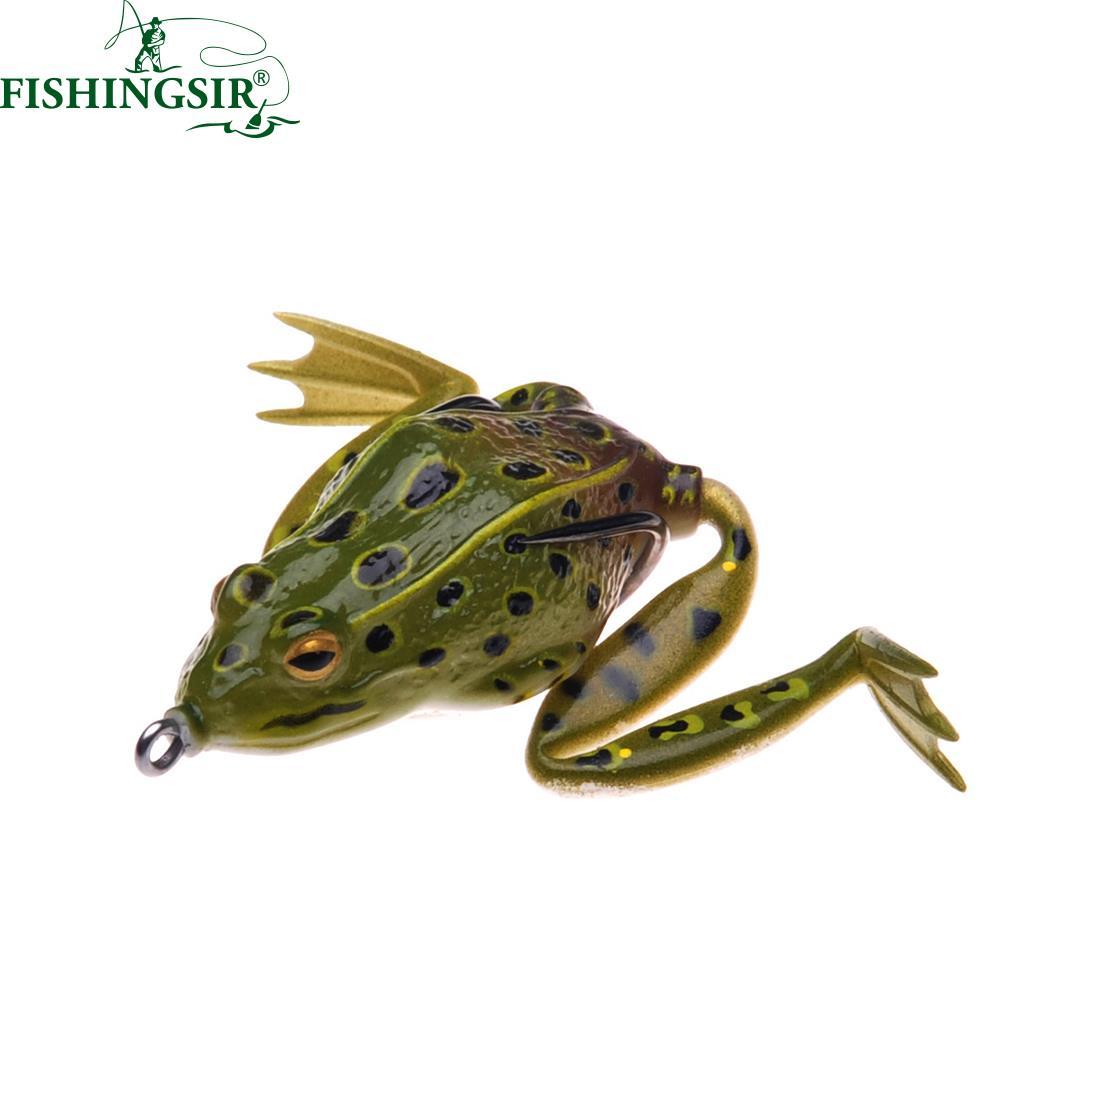 Topwater Frog Fishing Lure Silicon Soft Bait Freshwater Saltwater Bass Swimbait 55mm 16g 1set 10pcs soft silicone fishing lure bait freshwater saltwater